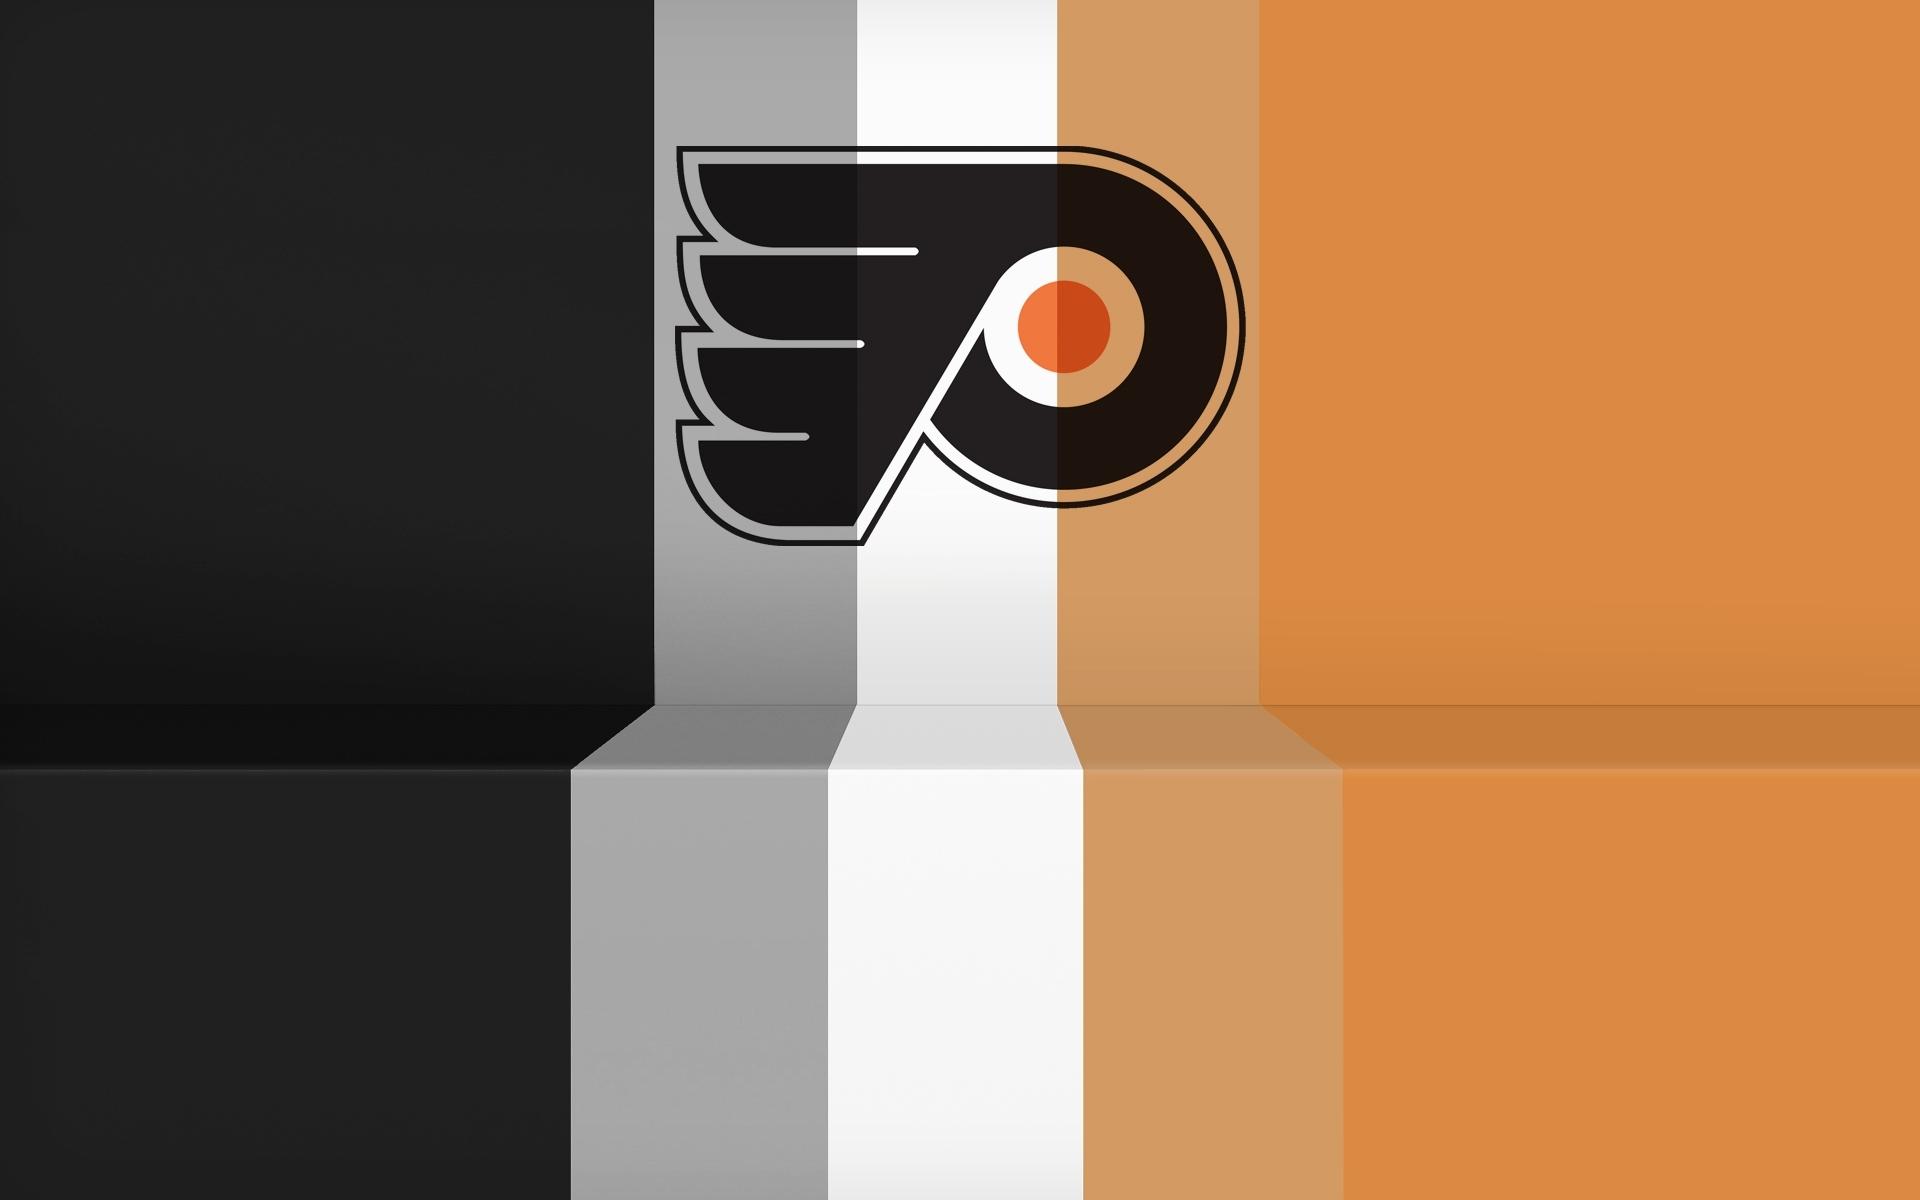 Hockey Nhl Philadelphia Flyers Wallpaper